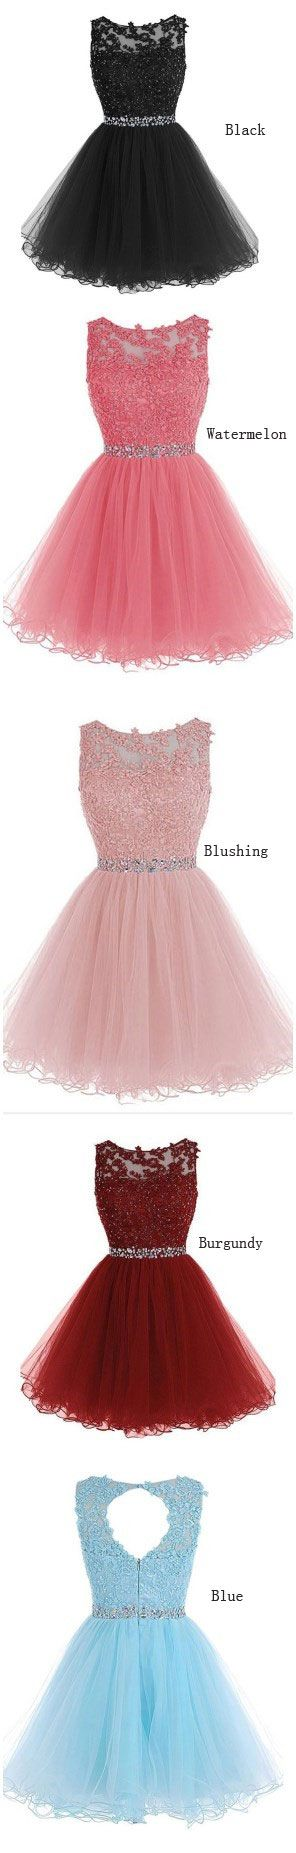 Lace appliqued short homecoming dresses for 2017,short prom dresses,senior formal dresses